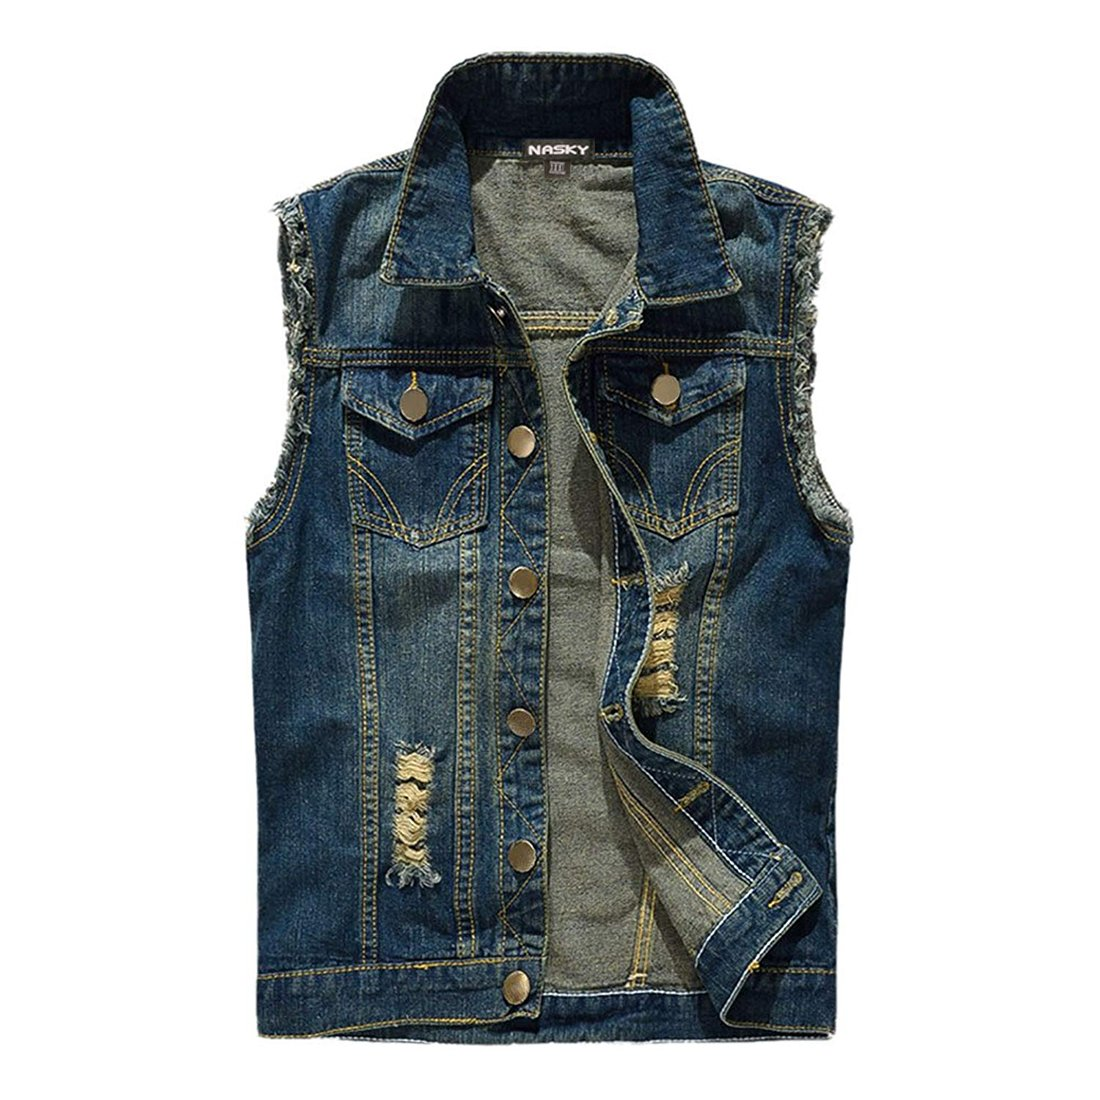 NASKY Men&Women's Fit Retro Ripped Denim Vest Sleeveless Lapel Jean Vest Jacket Waistcoat Top Plus Size X-Large by NASKY